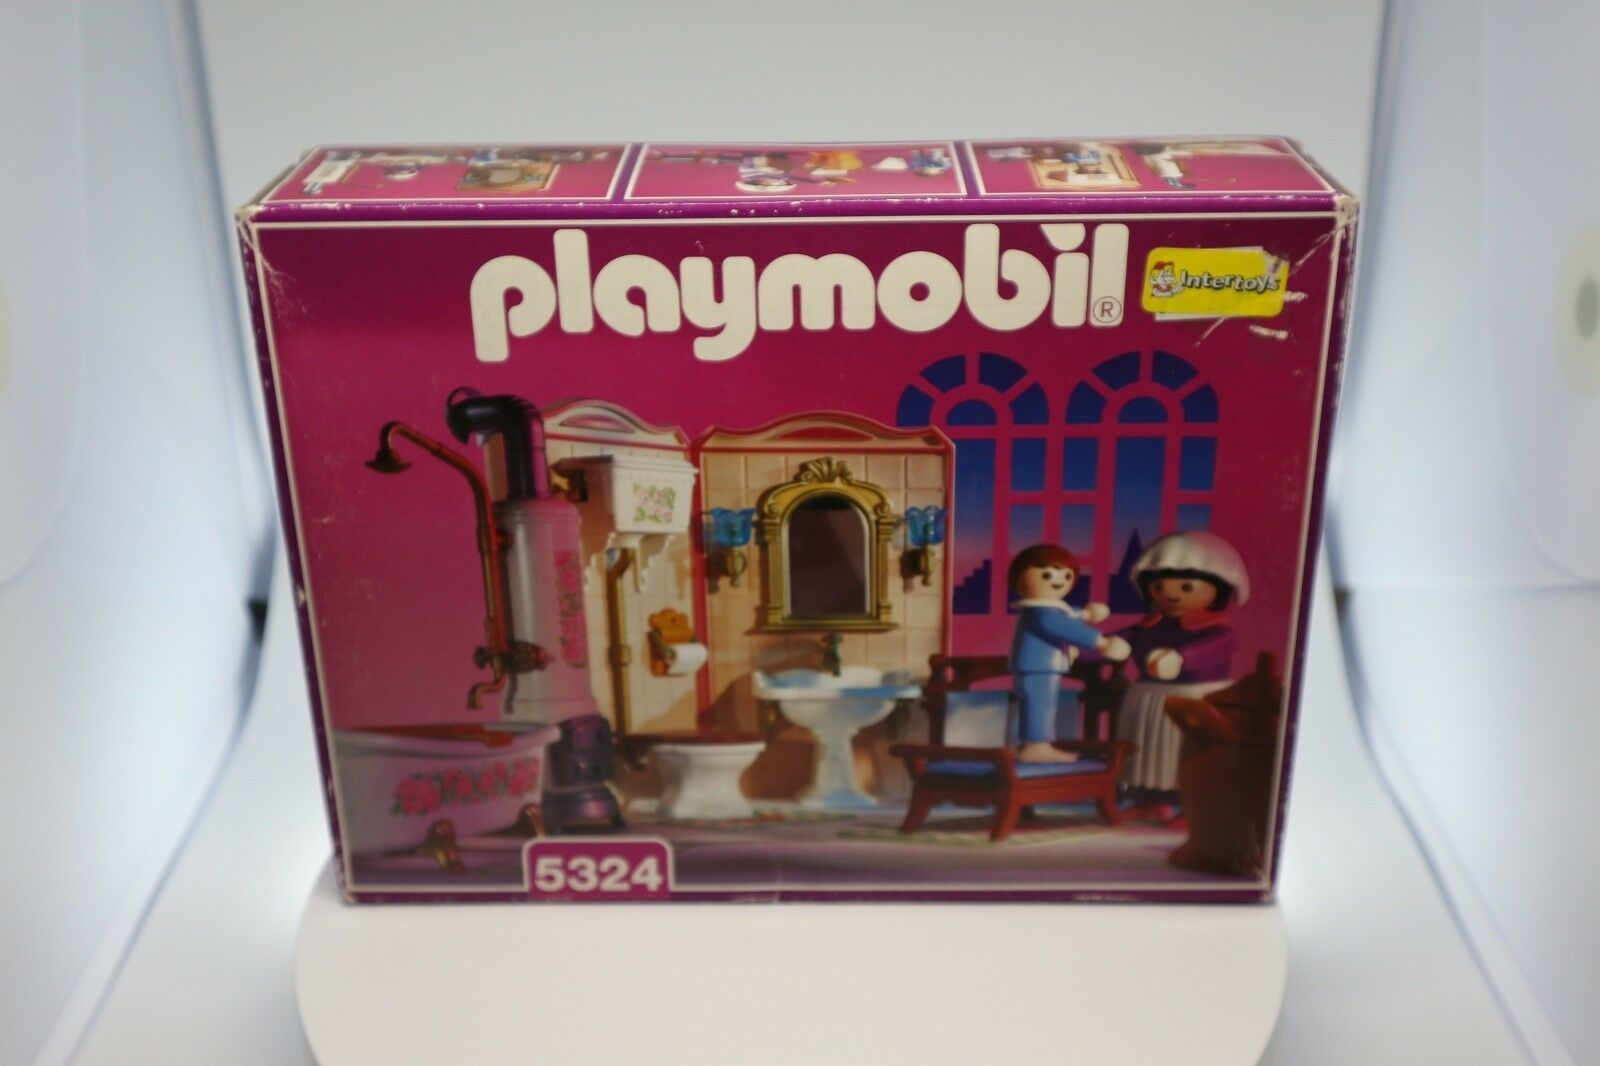 Playmobil vintage Rosa nr. 5324 puppenhaus poppenhuis dollhouse nostalgie